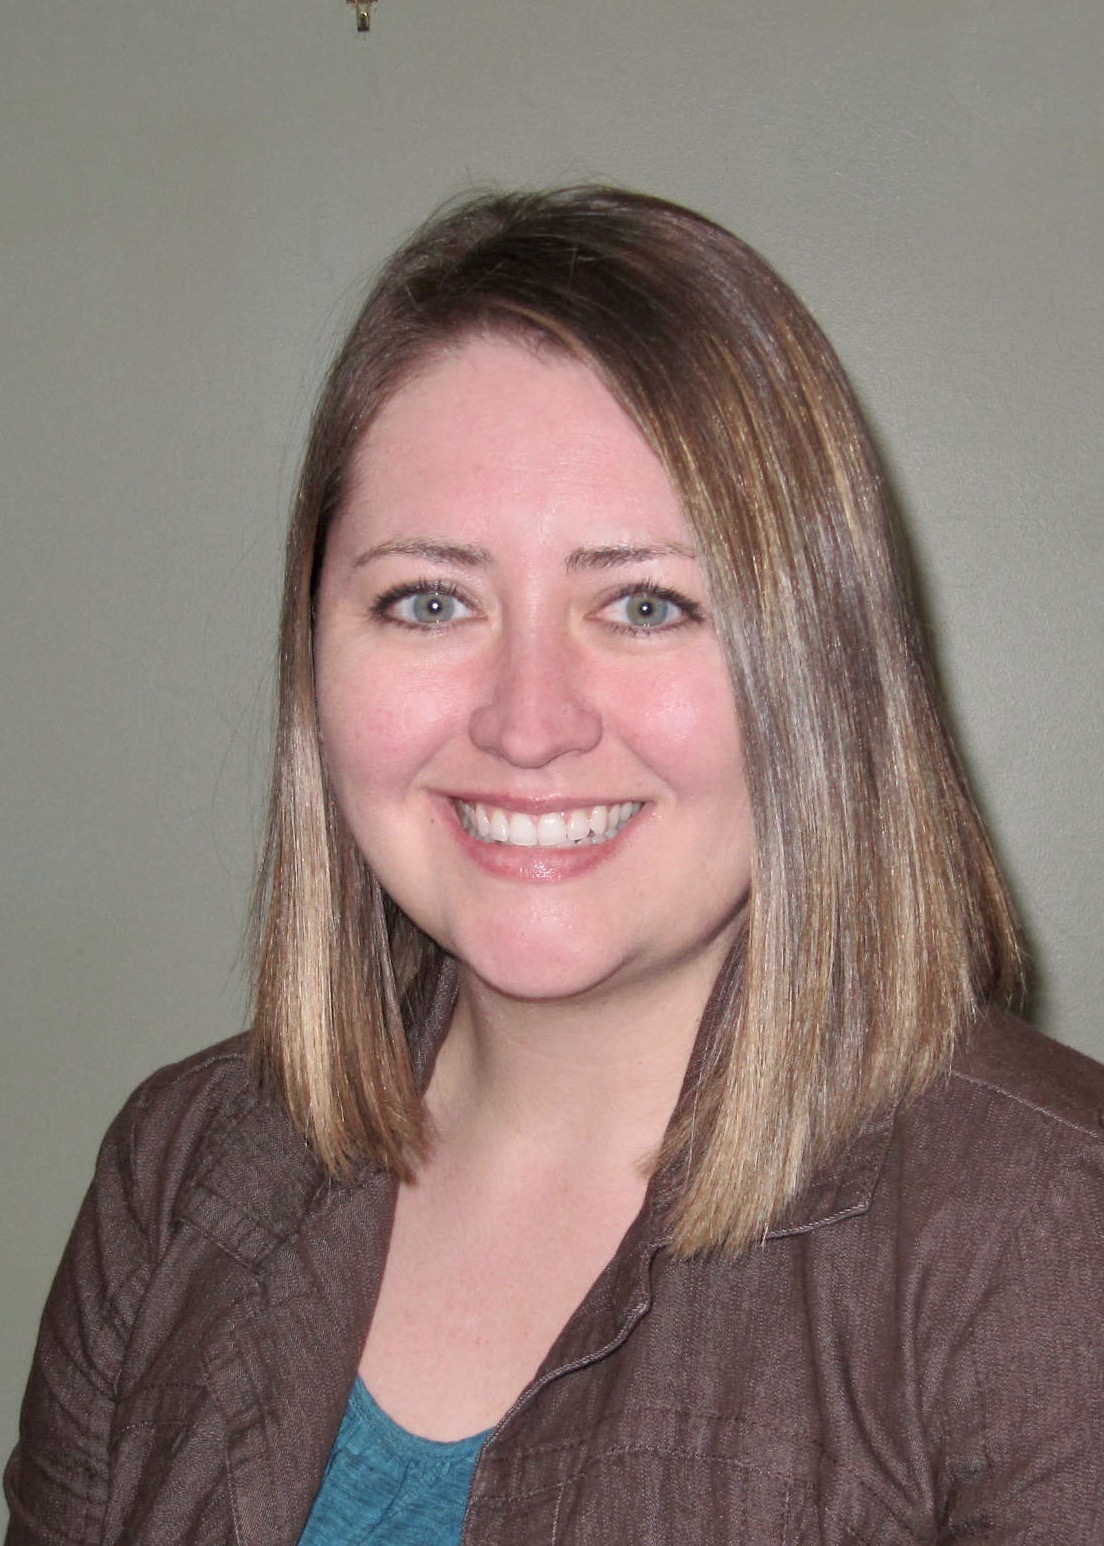 Novi MI Counselor, Therapist Kristen Sawyer, LLPC